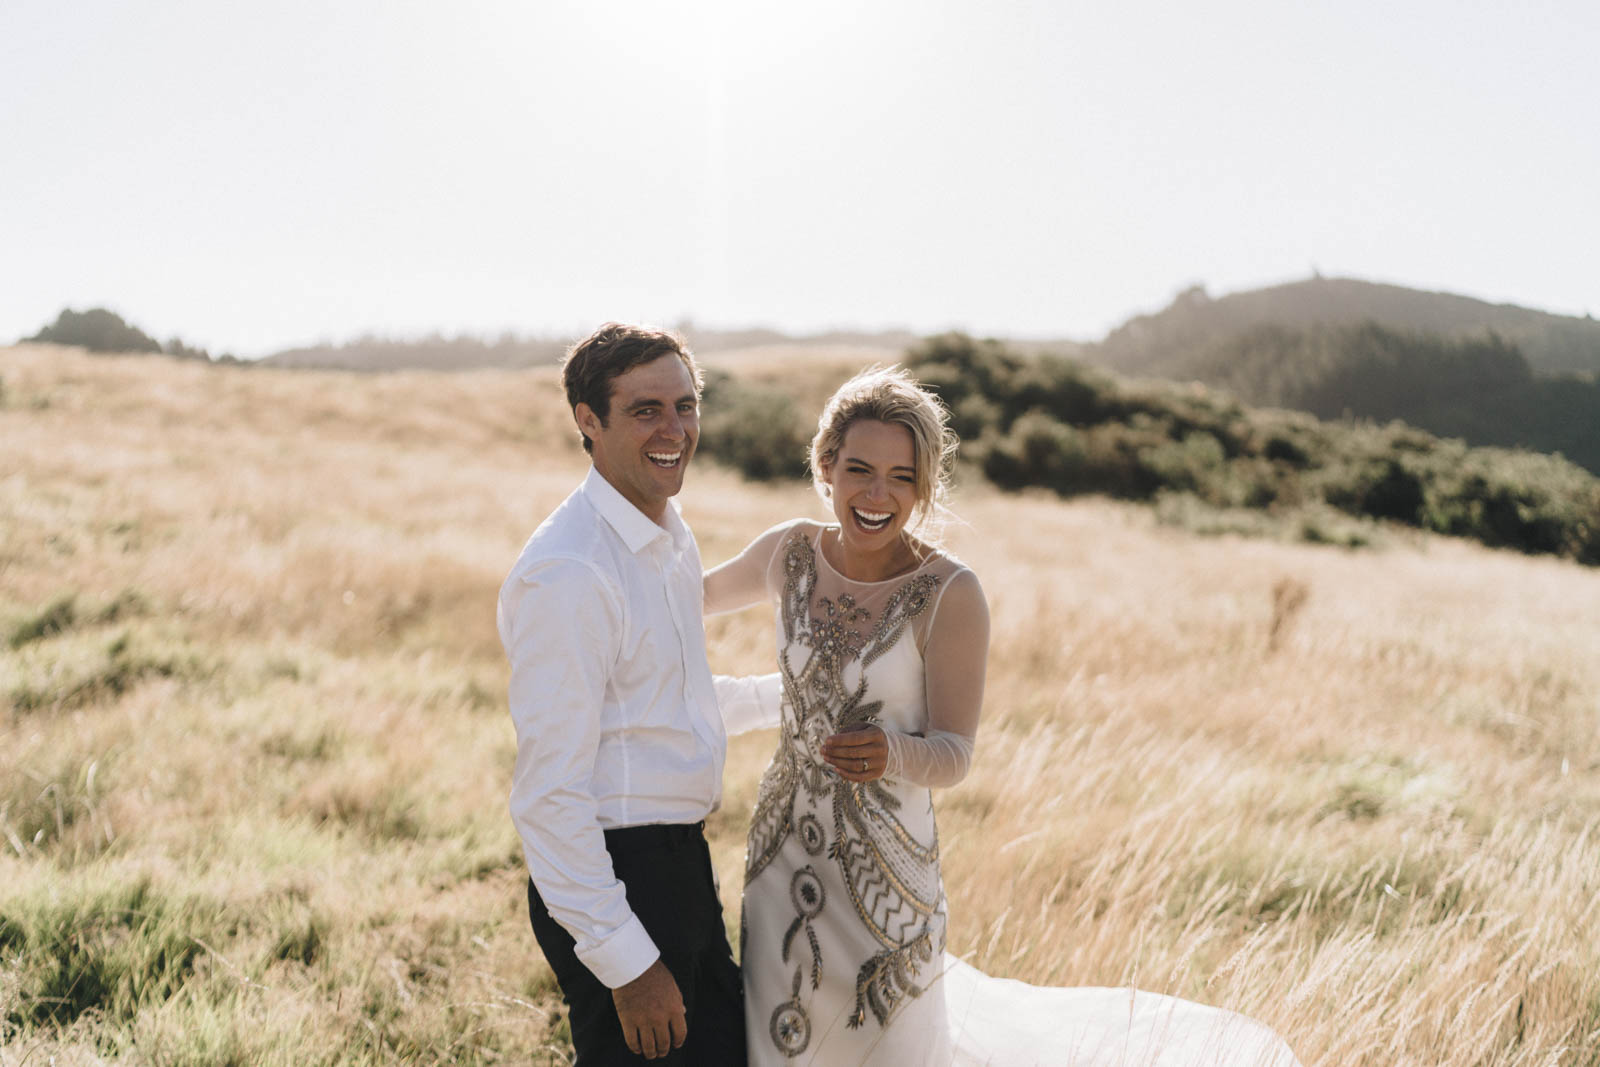 newfound-l-i-coromandel-wedding-photographer-1811-A9_04414